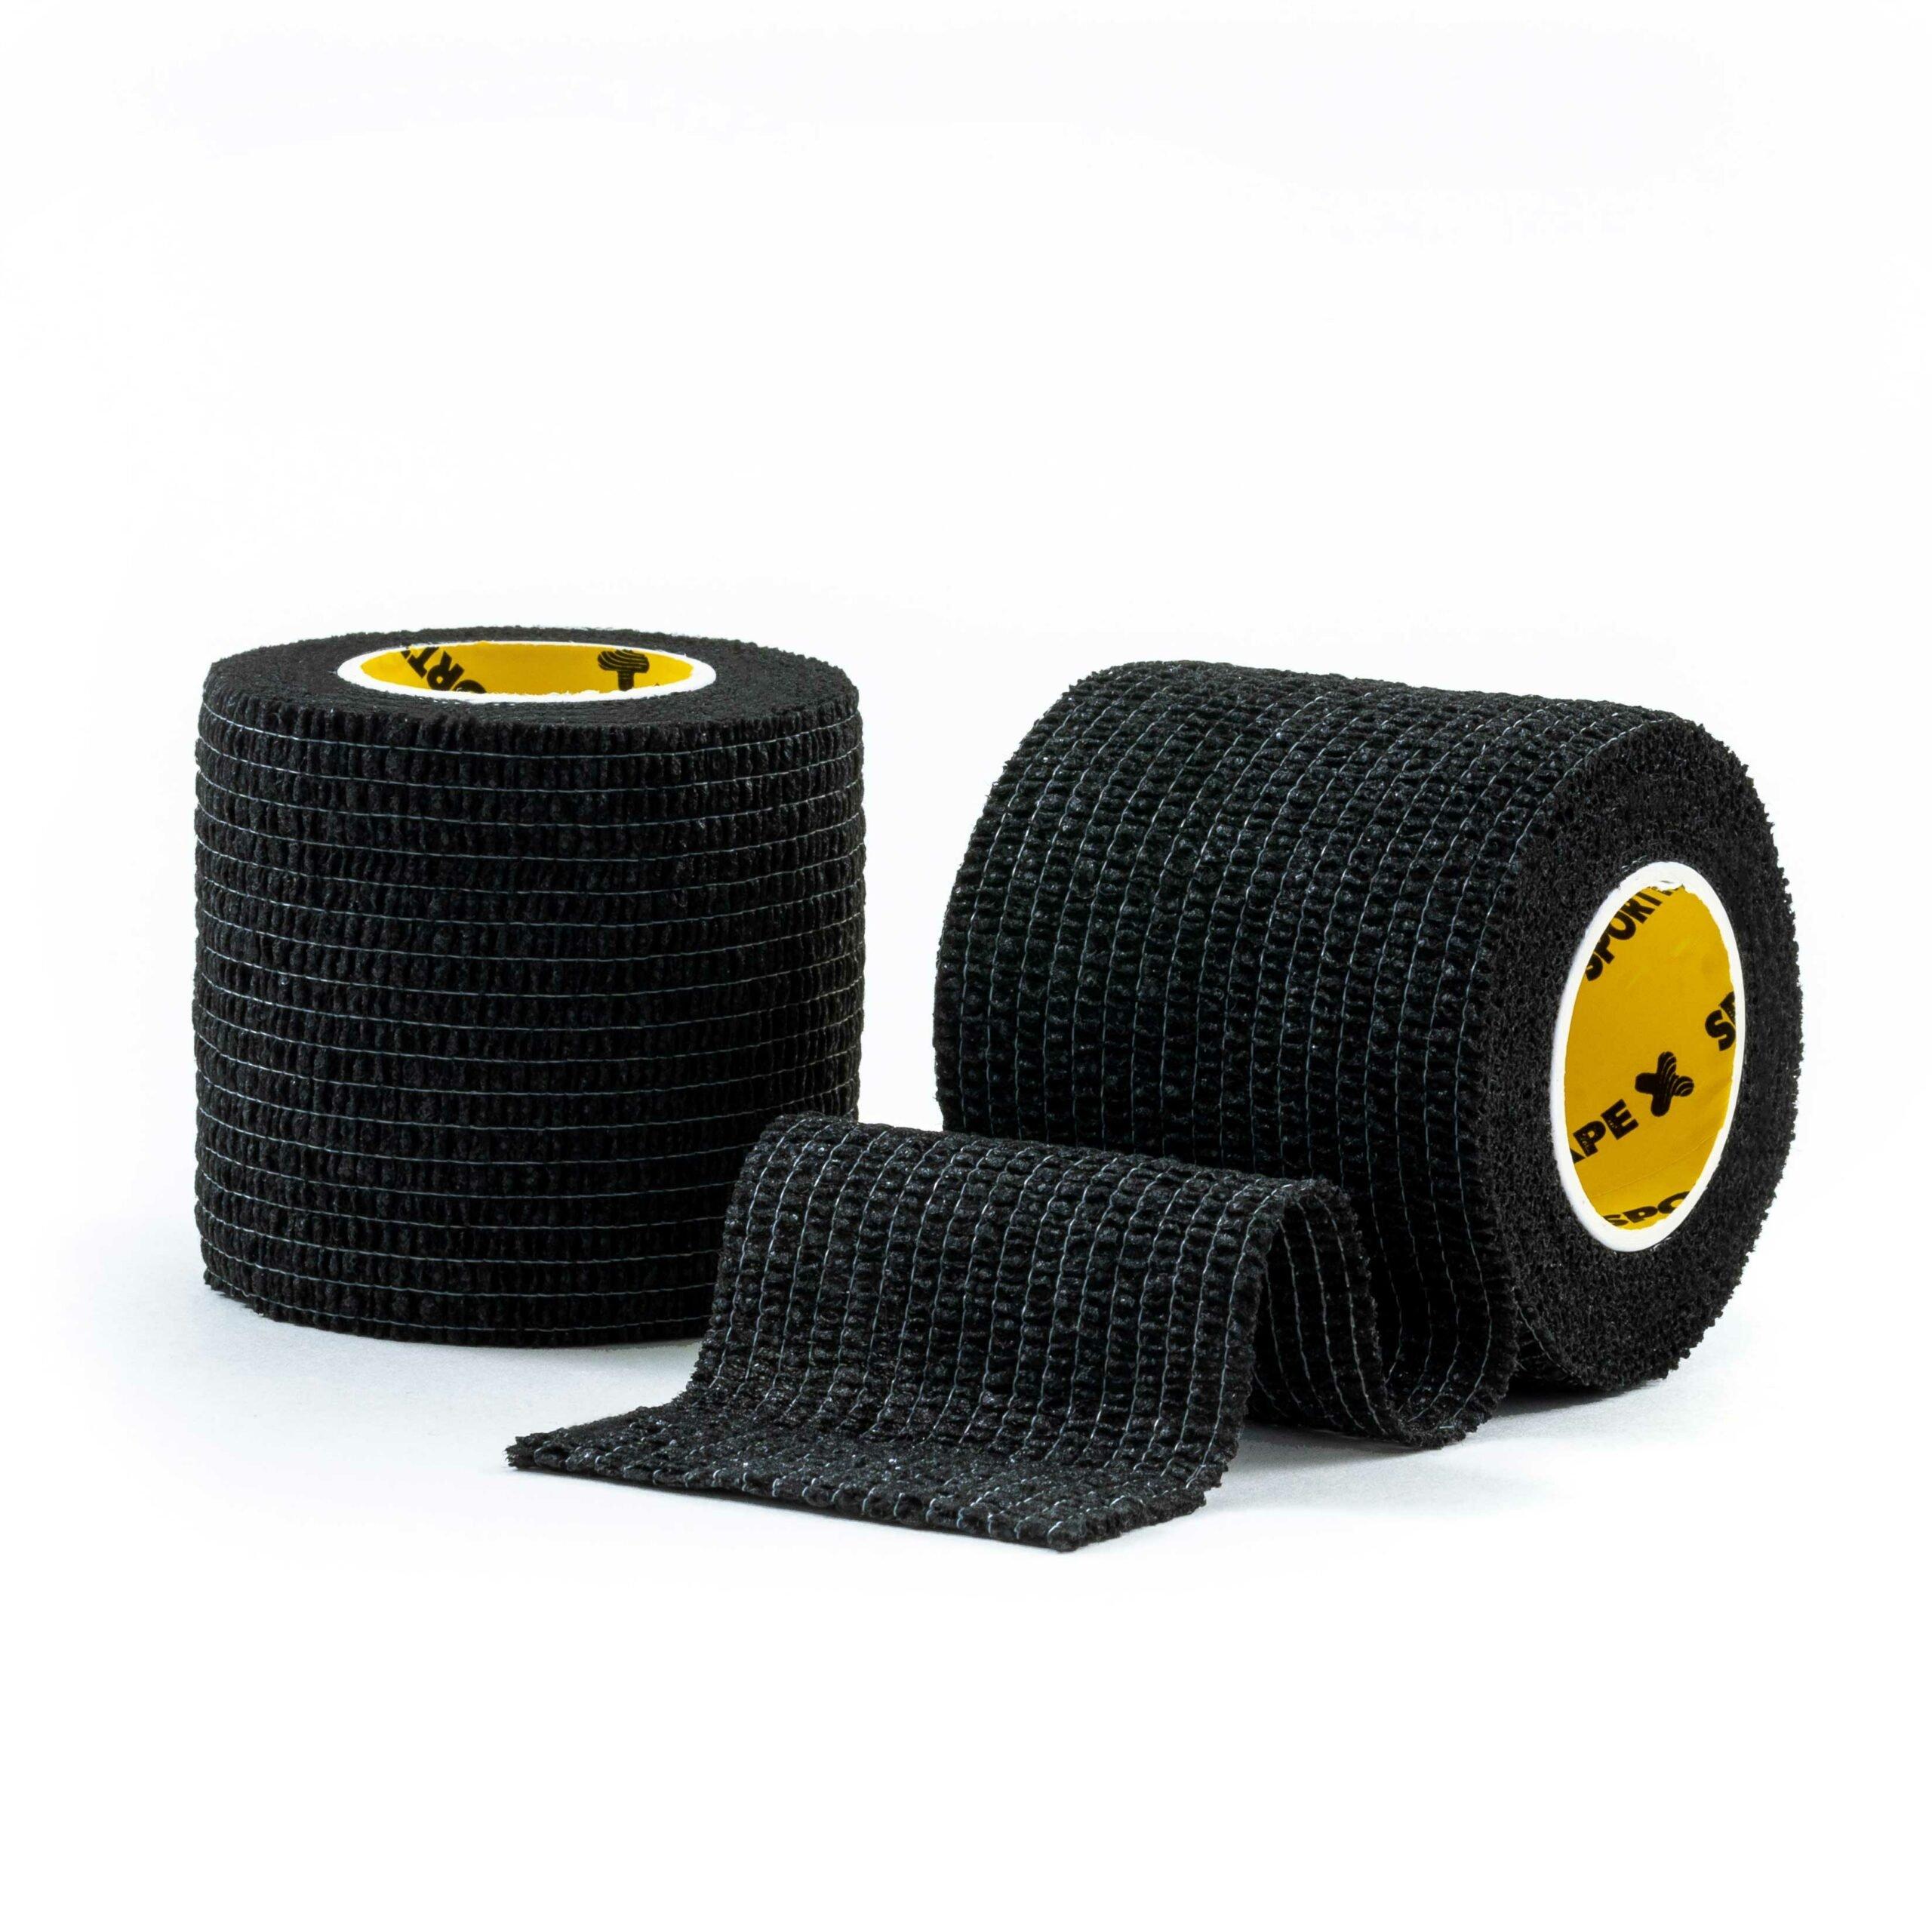 Cohesive Tape Black 5cm 2 Rolls